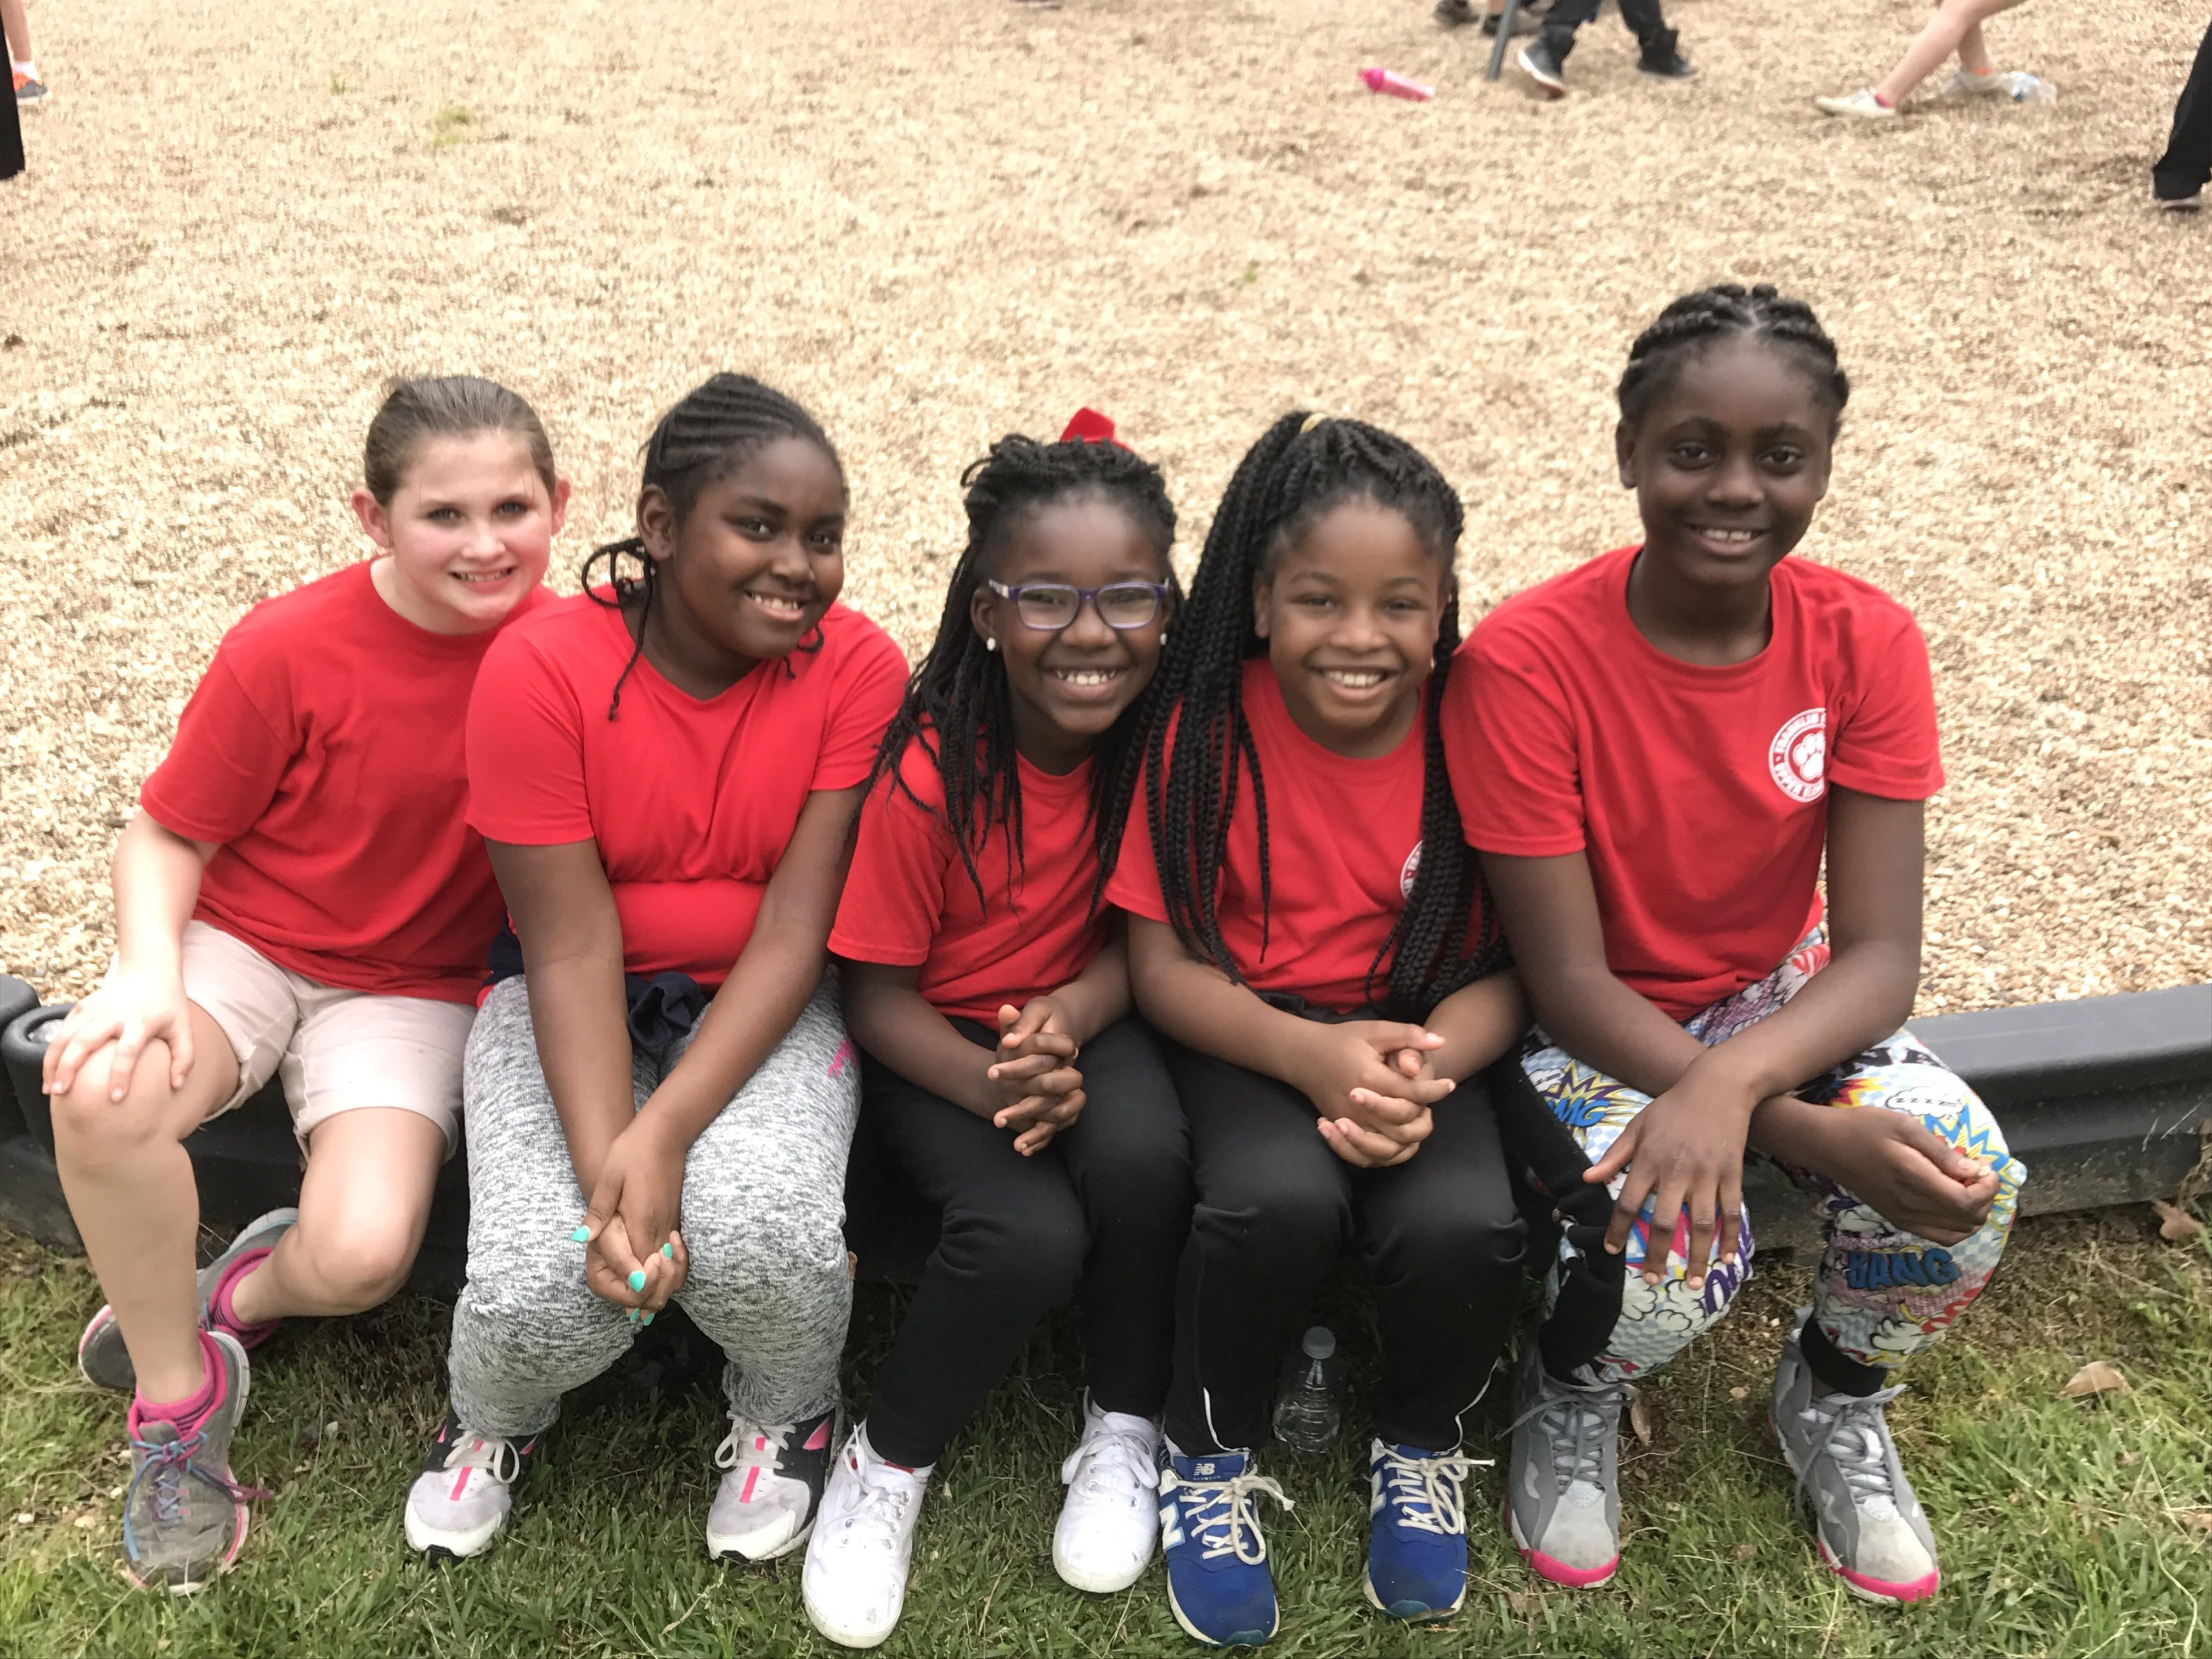 Red Pack girls on playground